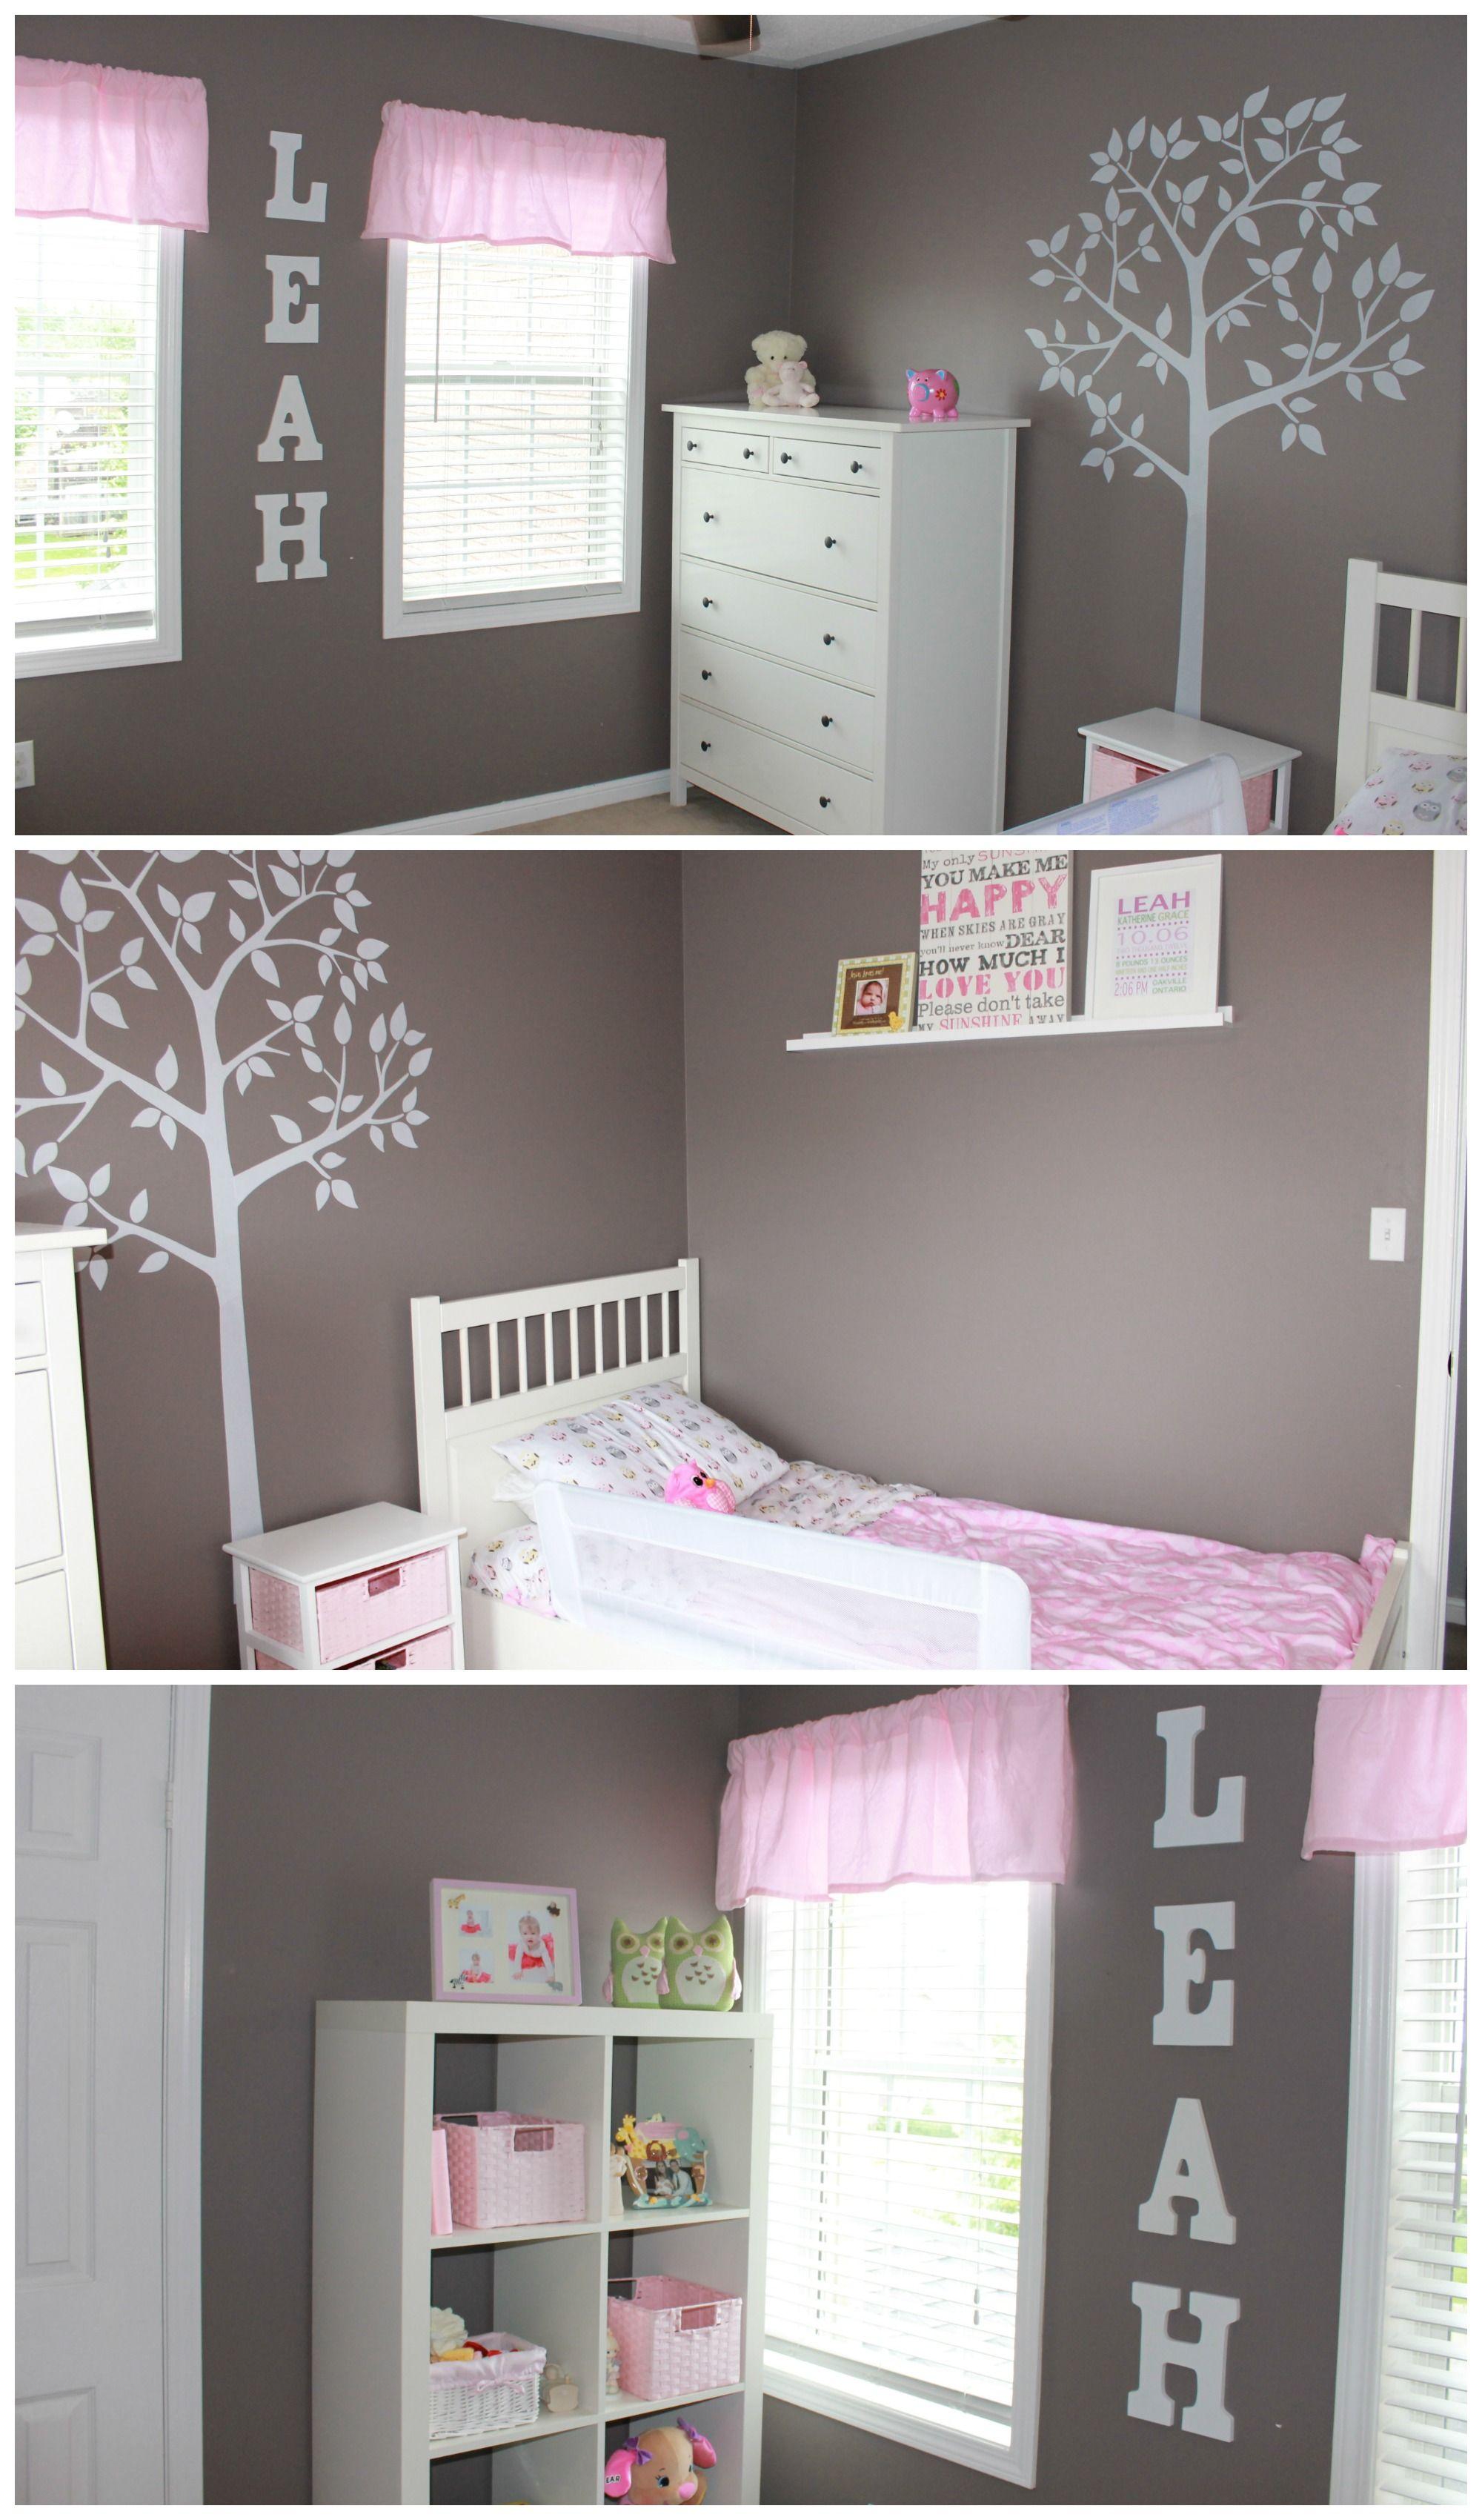 Big Girl Room Toddler Bedrooms Toddler Rooms Toddler Girl Room